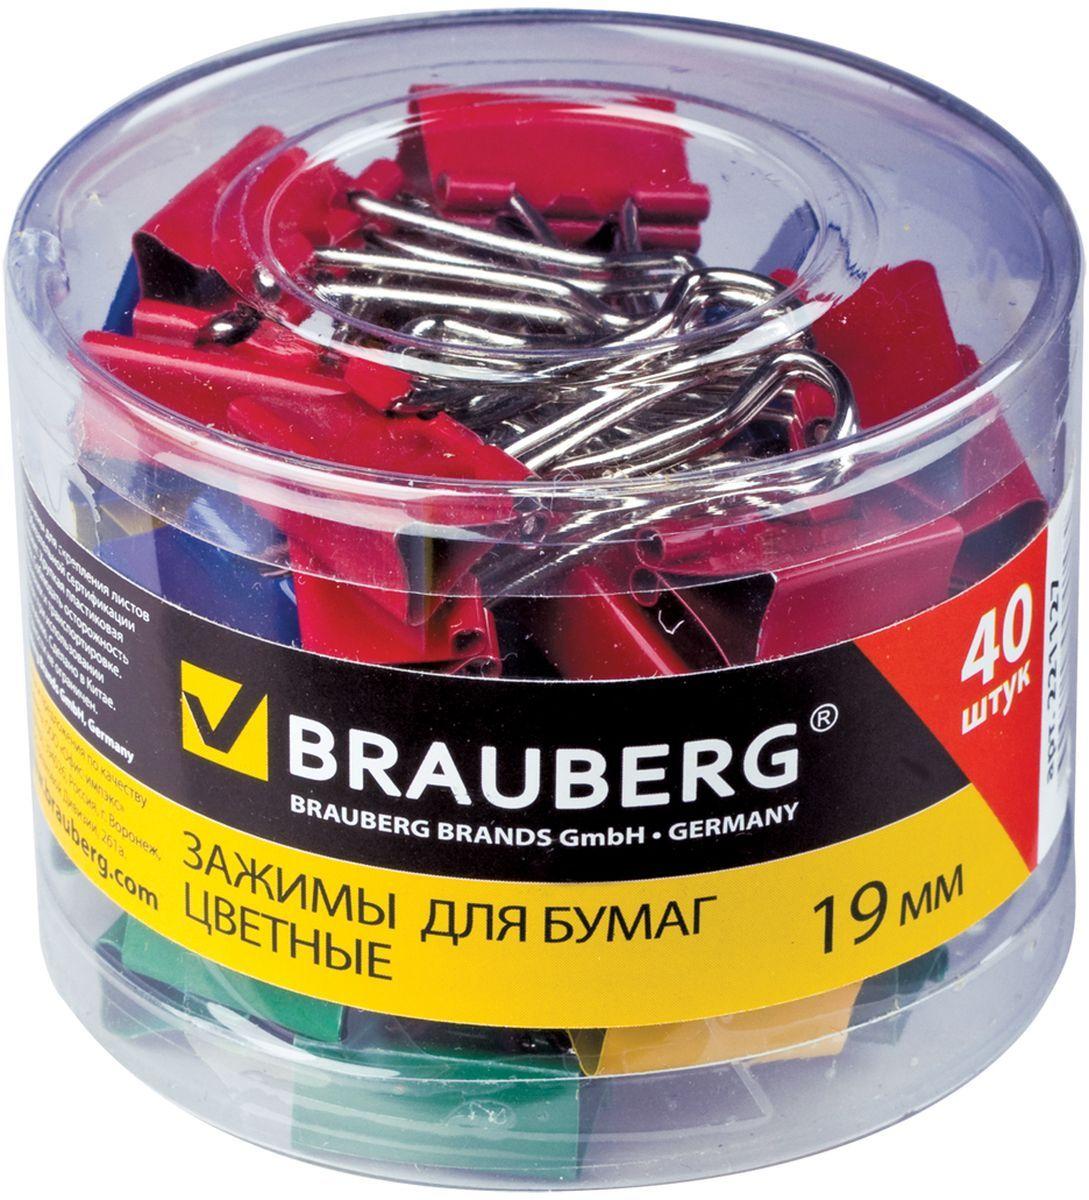 Brauberg Зажим для бумаг 19 мм 40 шт -  Скрепки, кнопки, зажимы